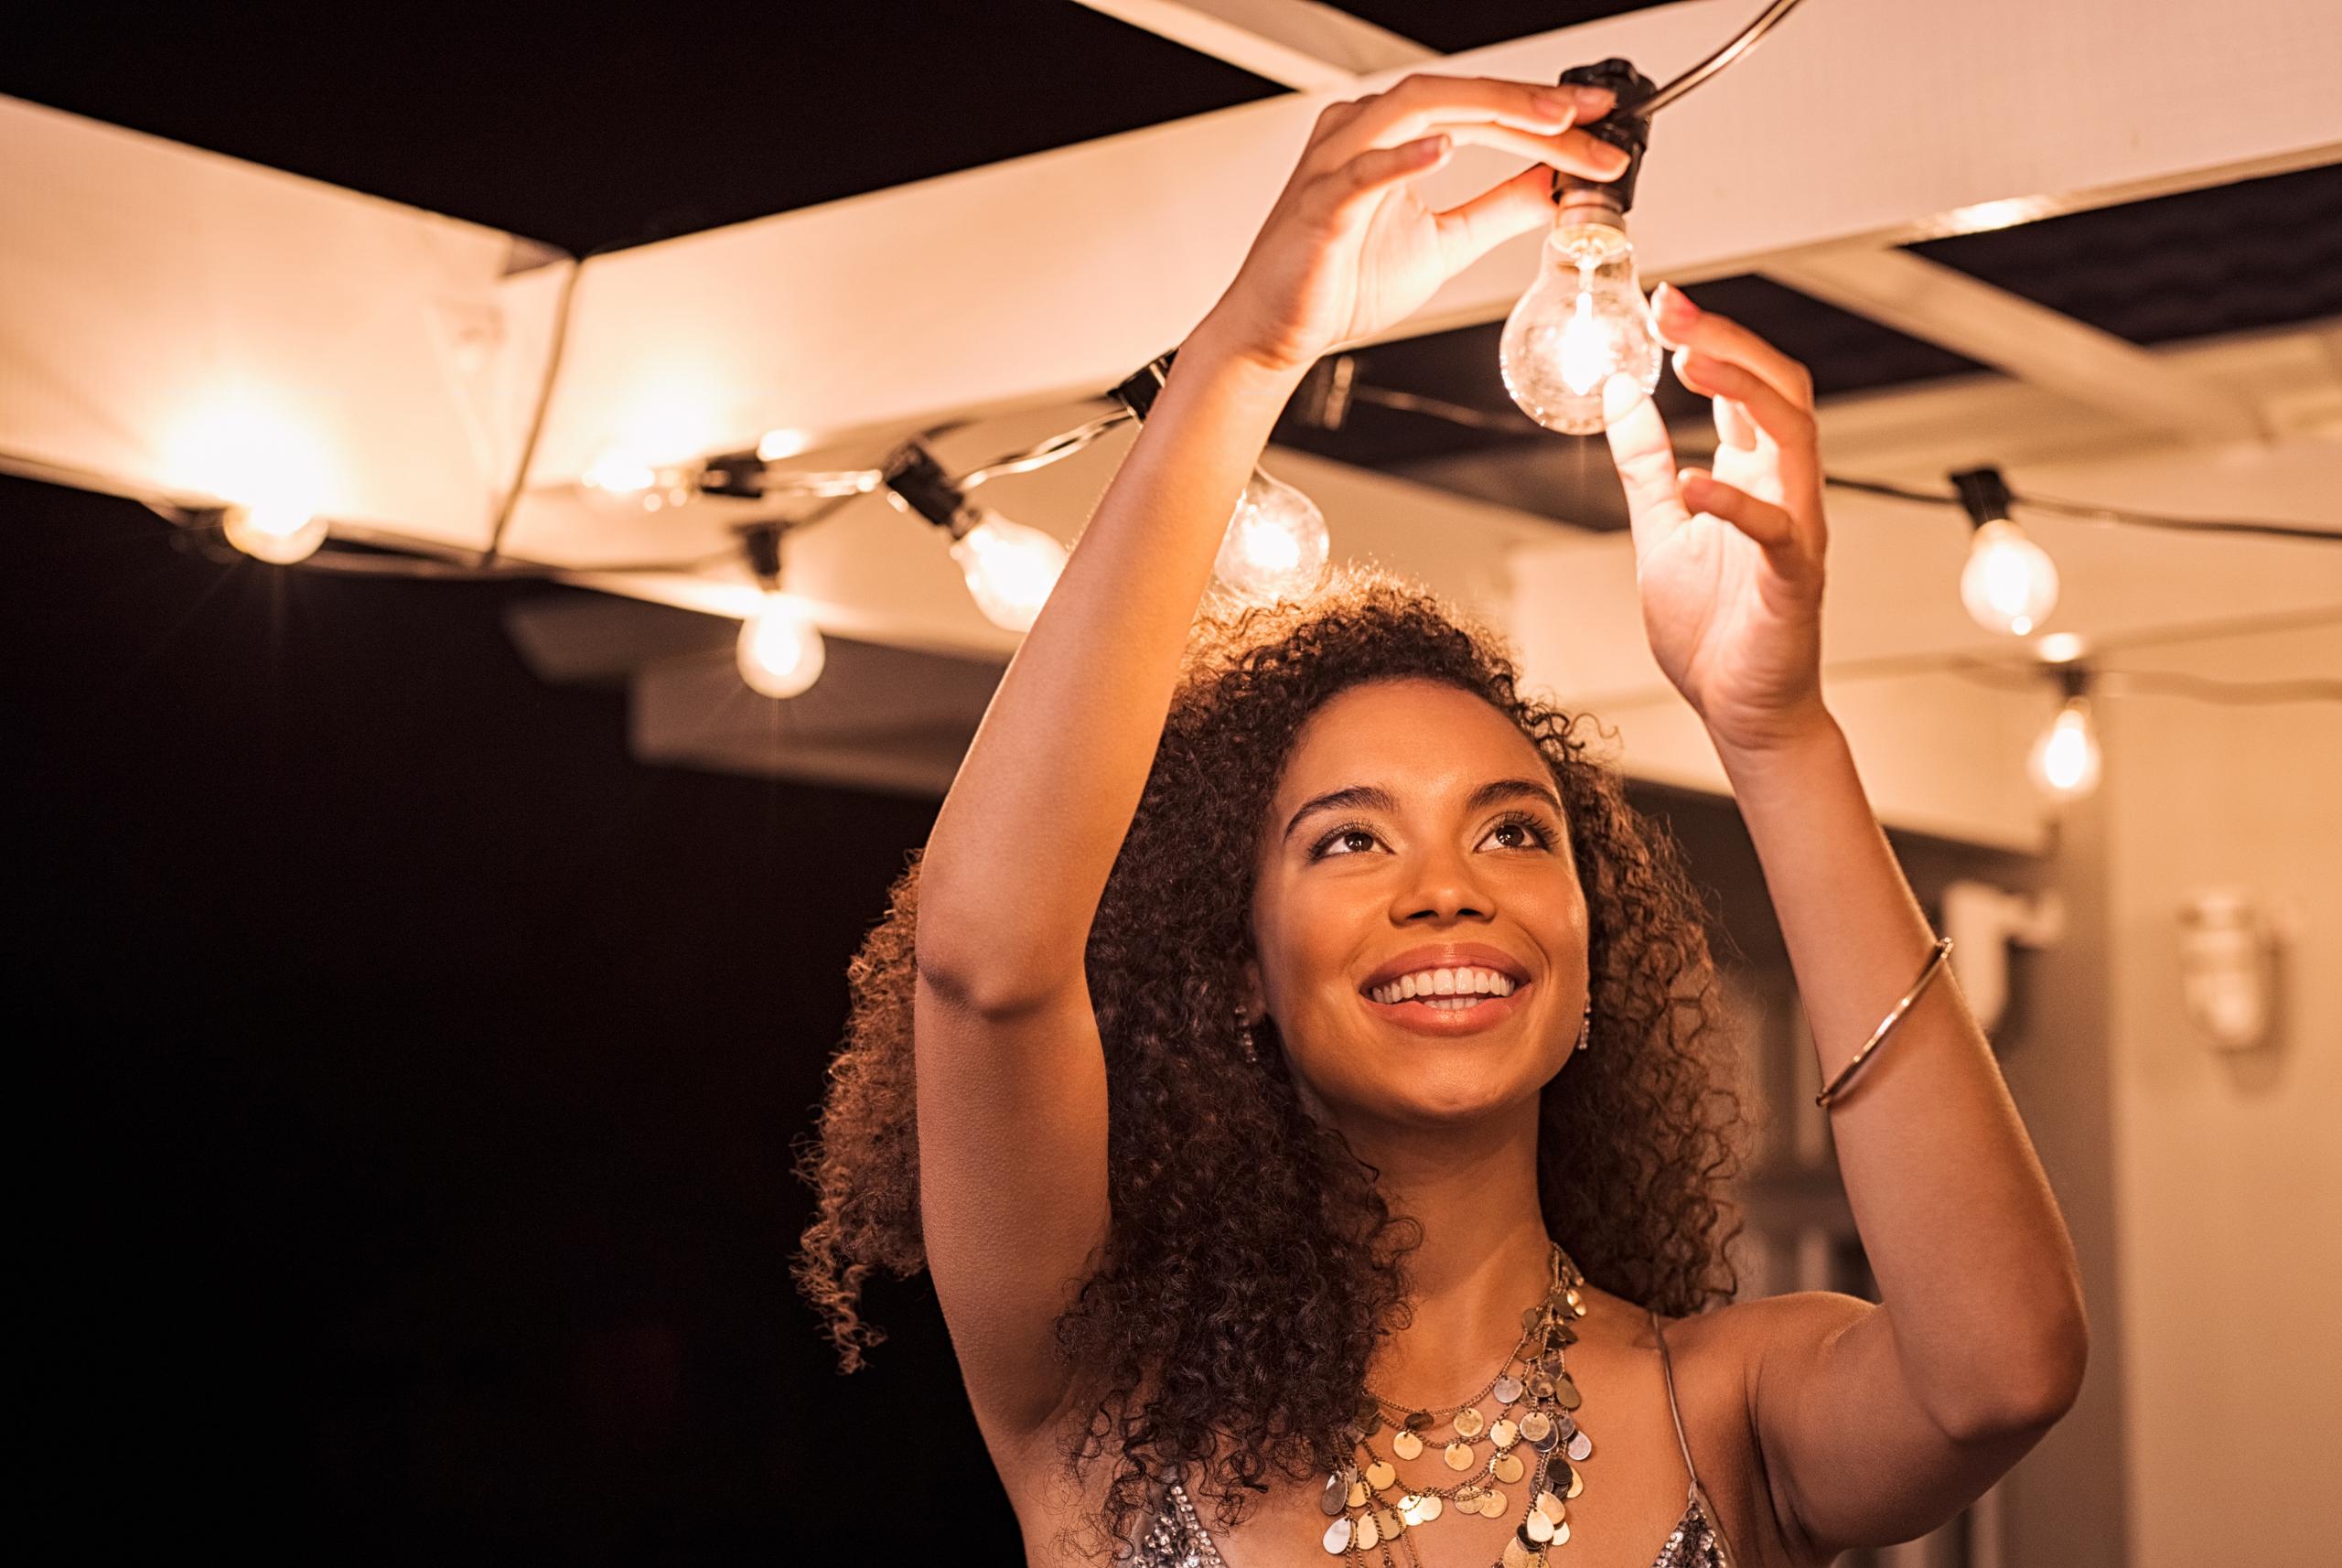 woman setting up party festoon lights